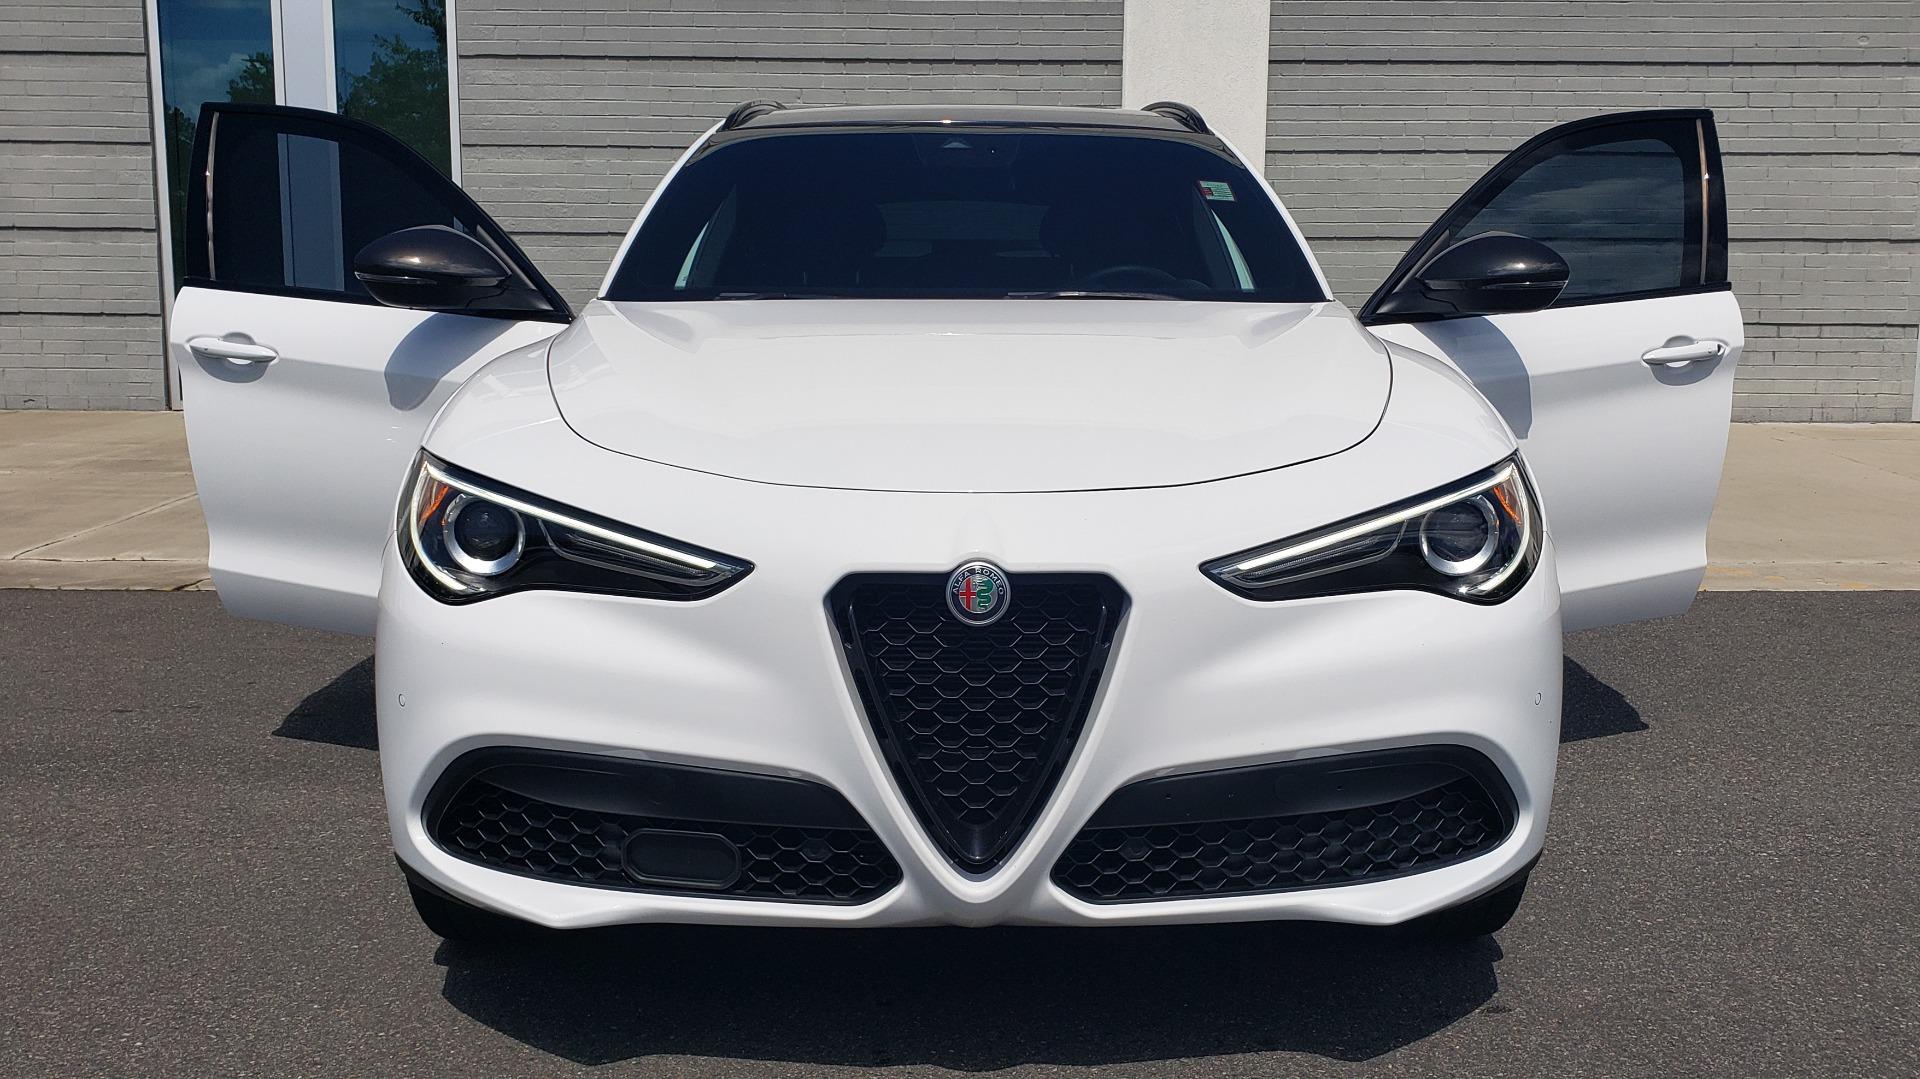 Used 2019 Alfa Romeo STELVIO TI SPORT AWD / 2.0L TURBO / 8-SPD AUTO / DRVR ASST / REARVIEW for sale $37,495 at Formula Imports in Charlotte NC 28227 25